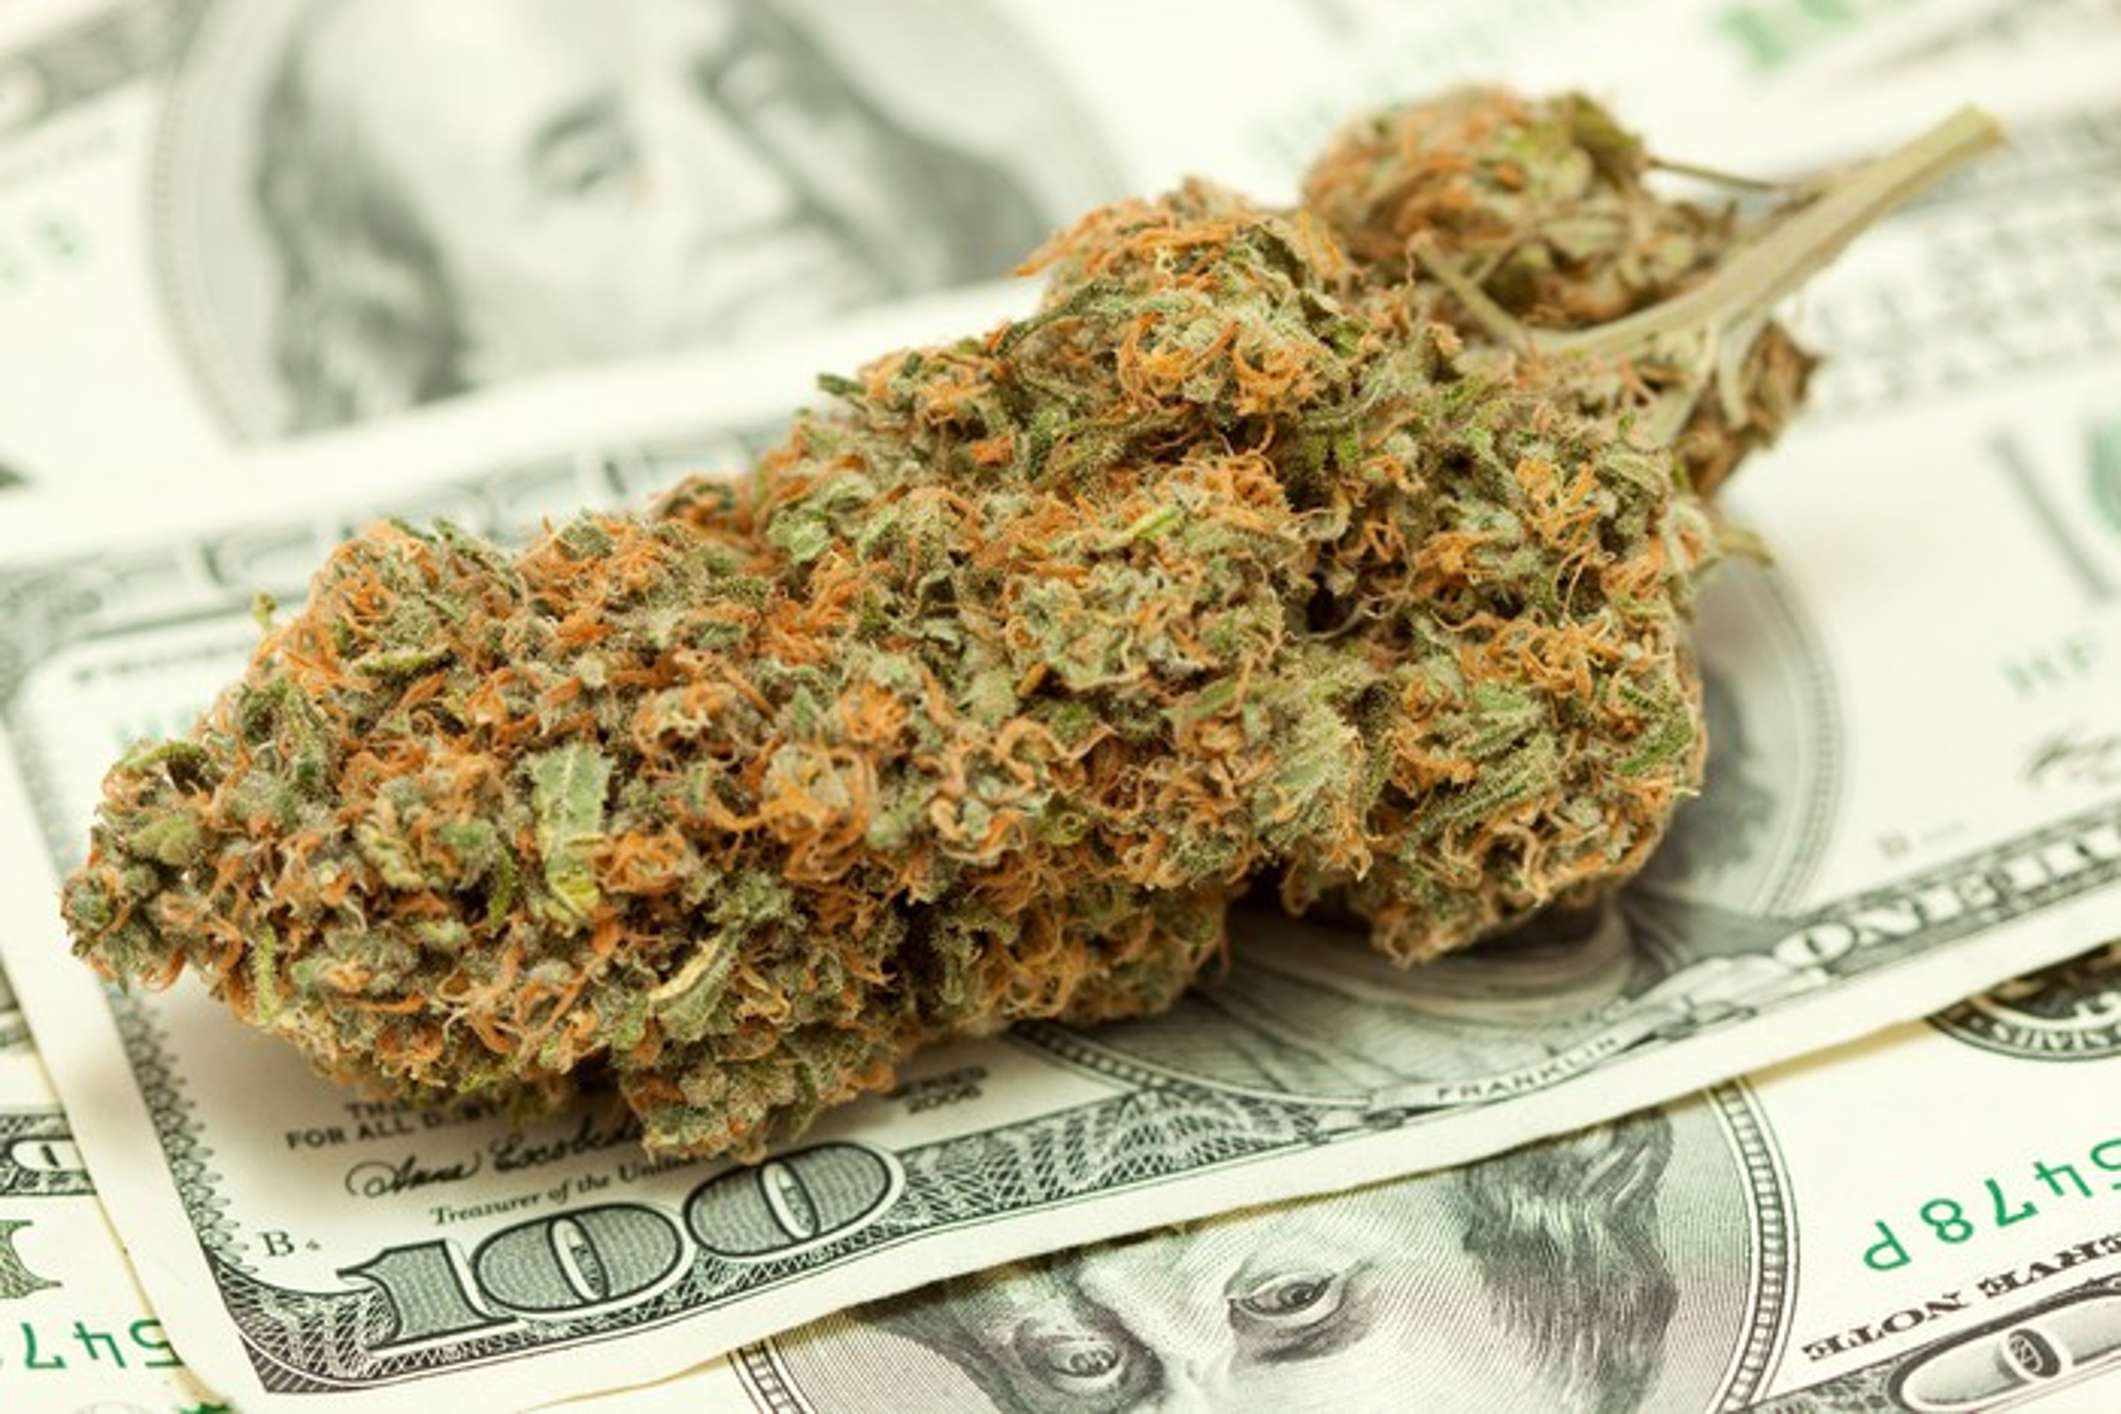 Marijuana bud resting on top of cash.